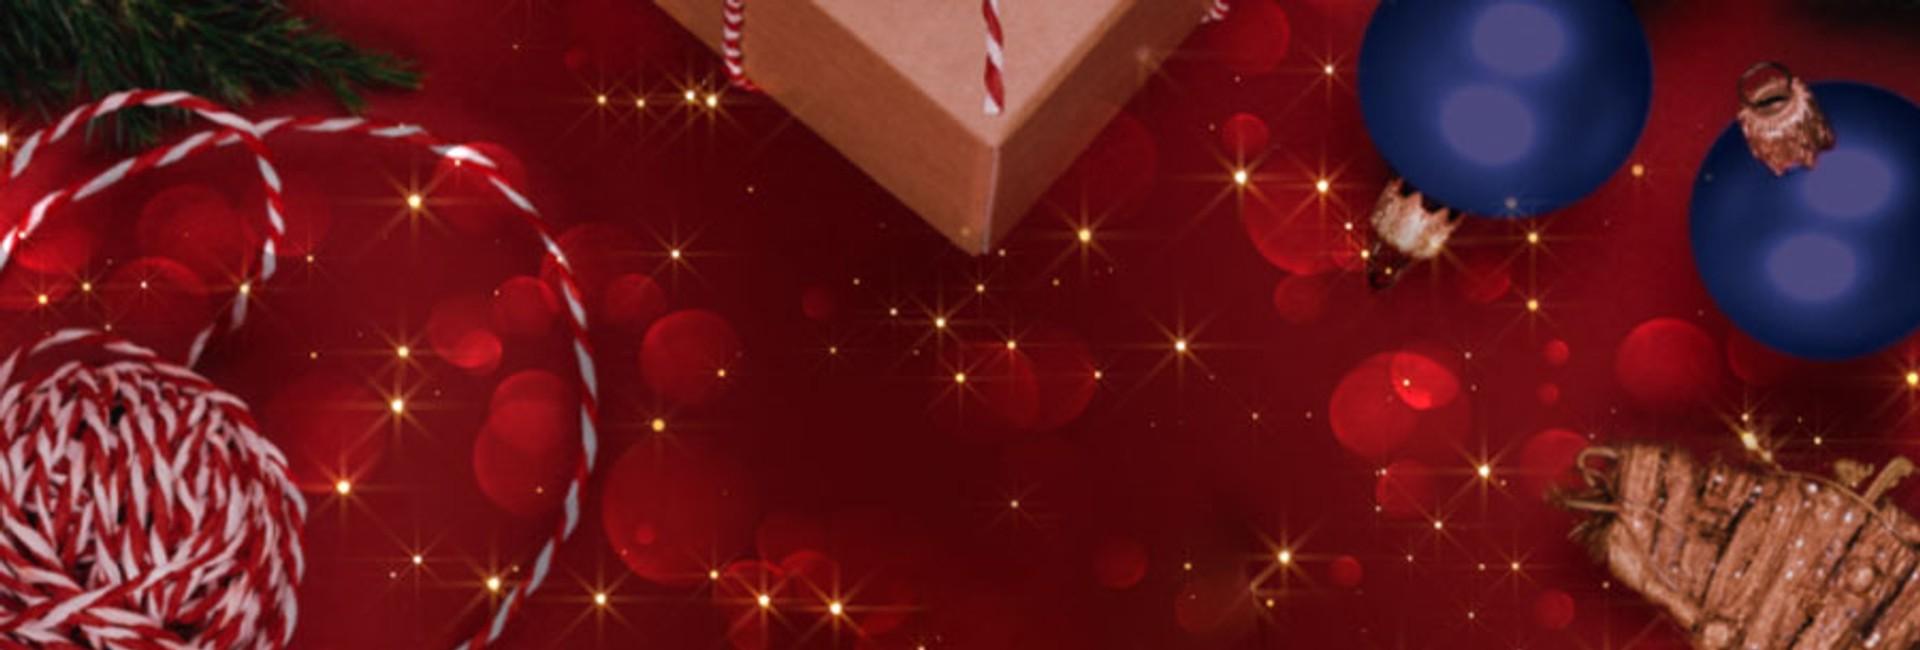 Najkrajšie Vianoce